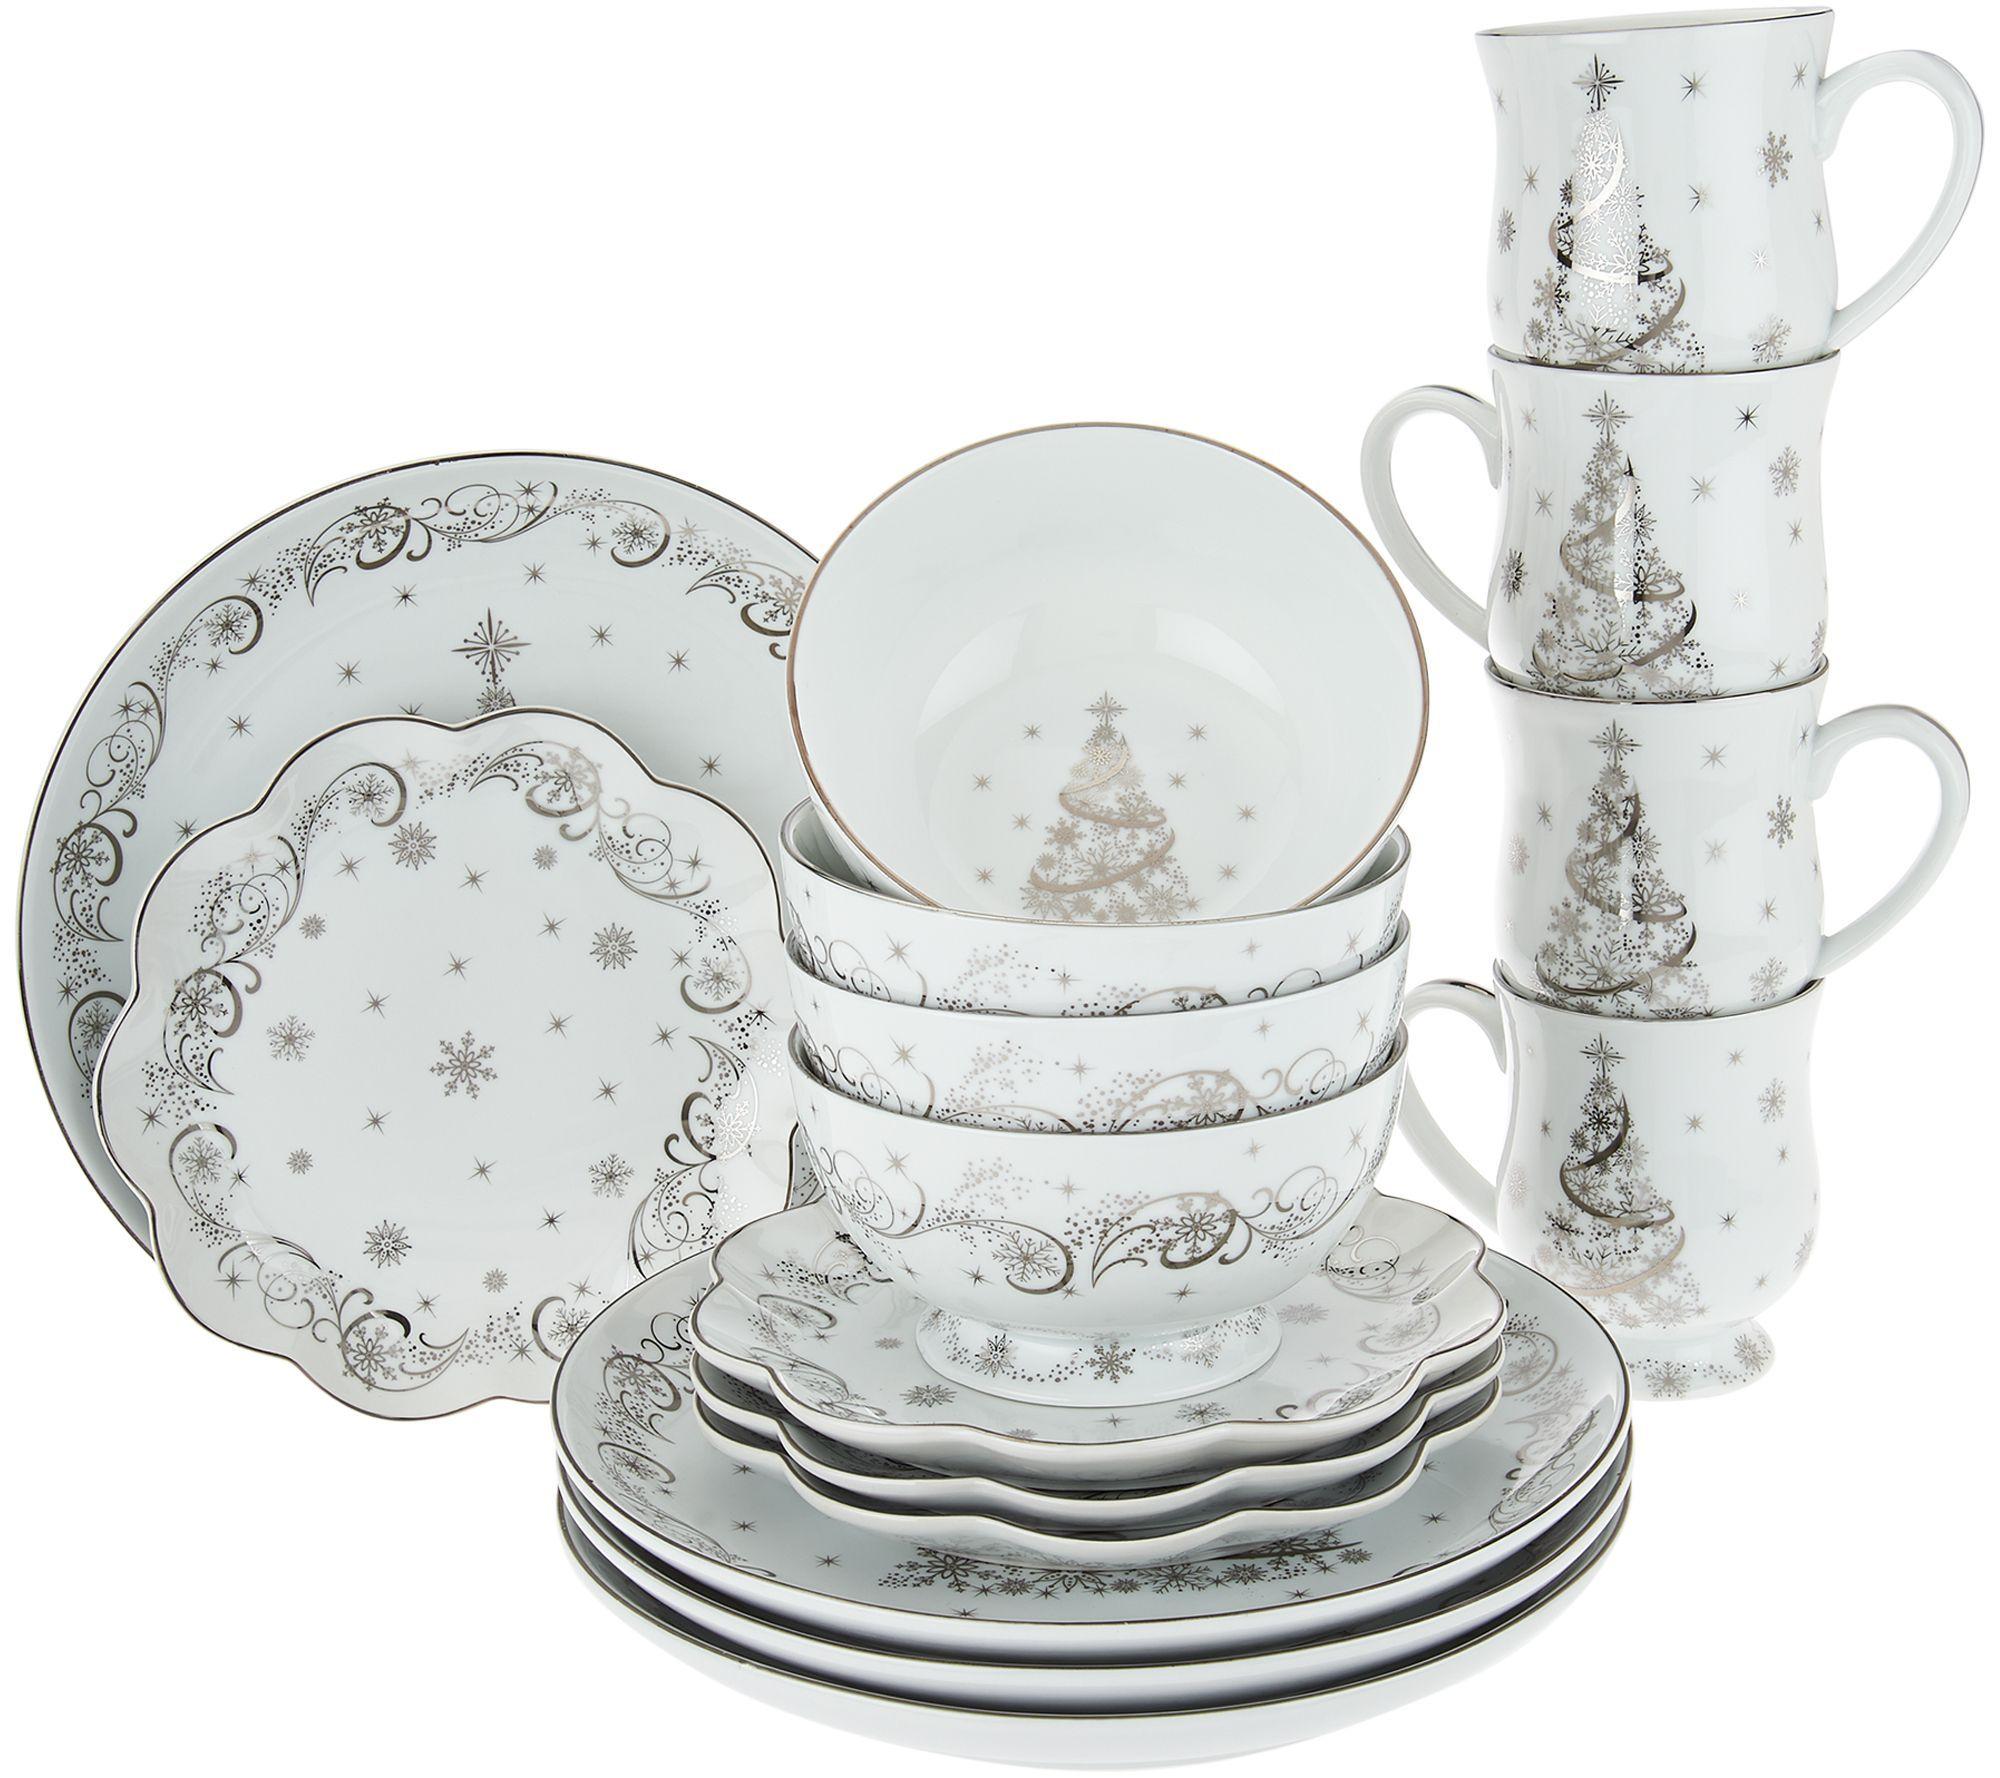 Temp Tations Metallic Christmas Eve 16 Piece Dinnerware Set Qvc Com Christmas Dinnerware Sets Christmas Dinnerware Holidays Christmas Dishes Sets